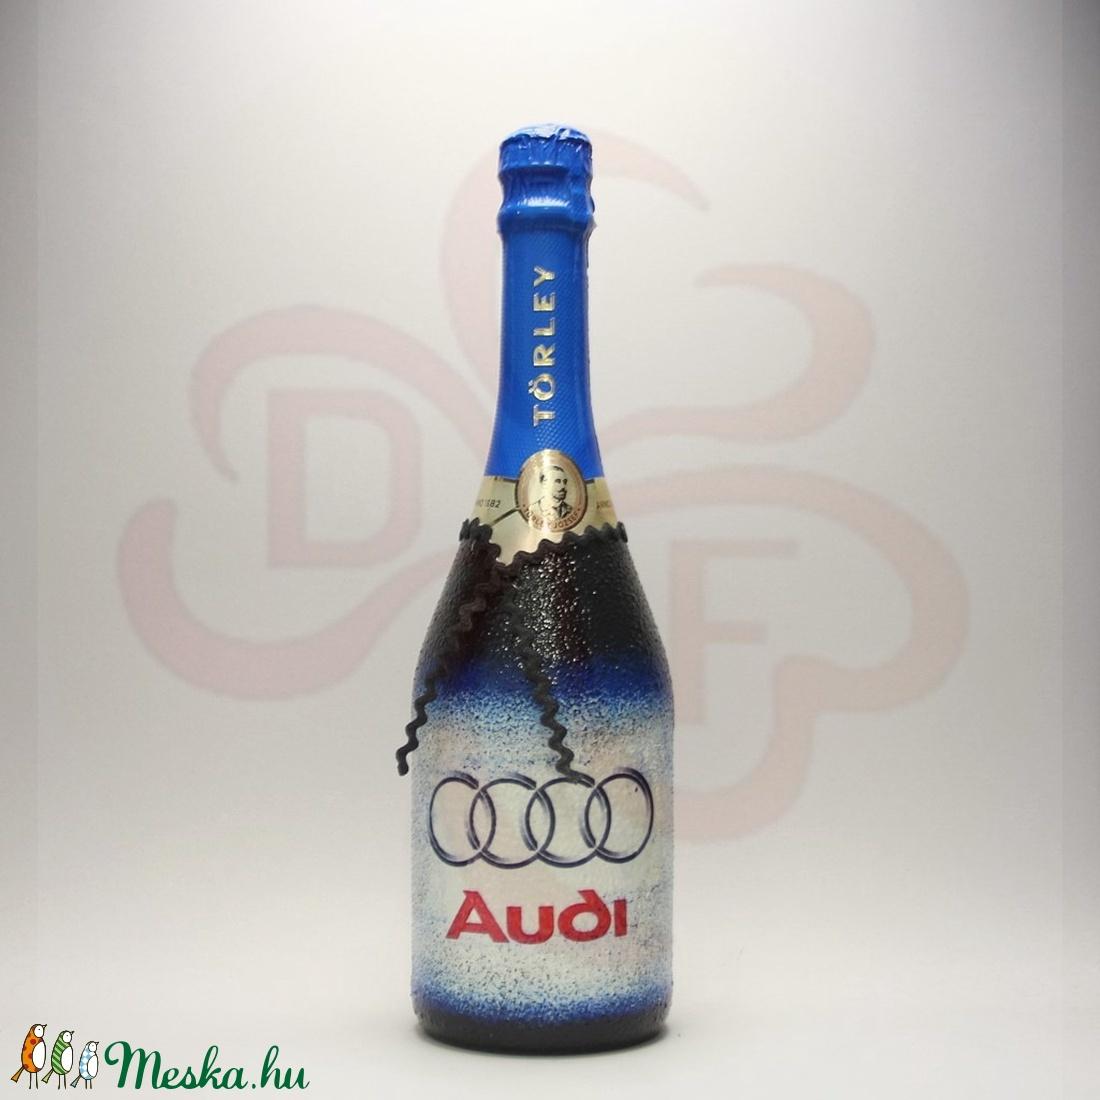 Audi logós pezsgő ; Audi rajongóknak - Meska.hu